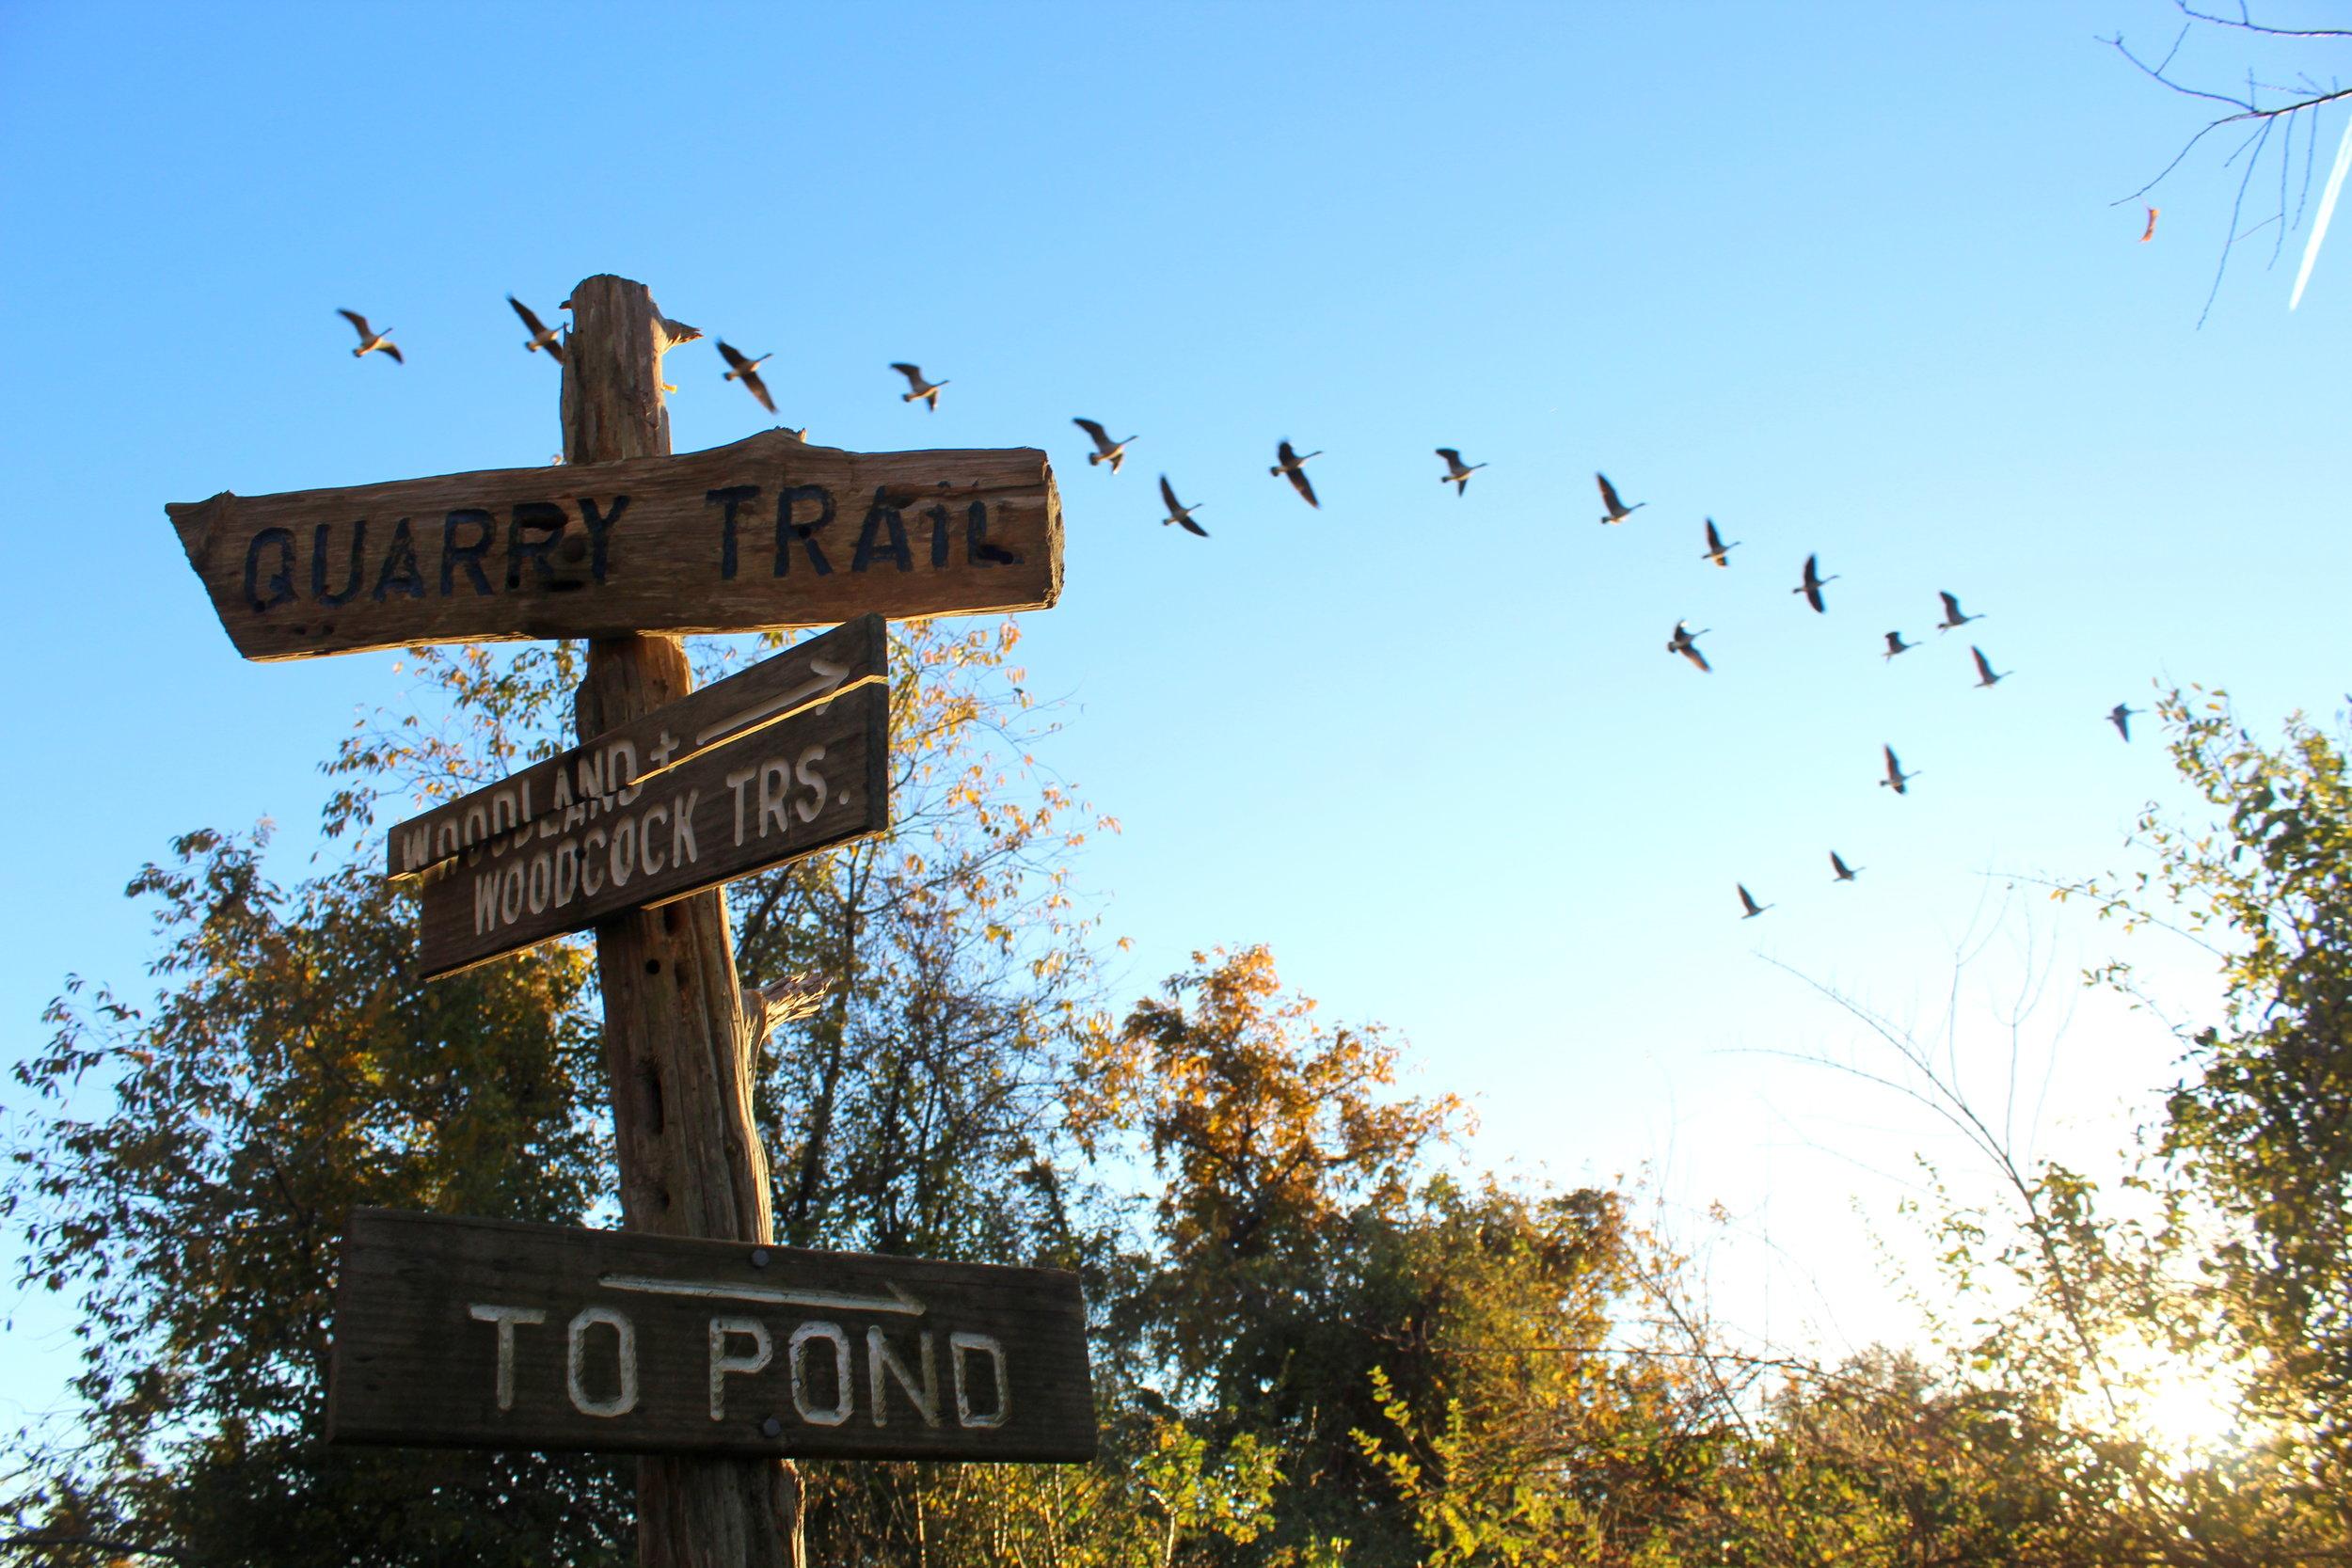 11-7 trail sign geese 2 11-7.JPG